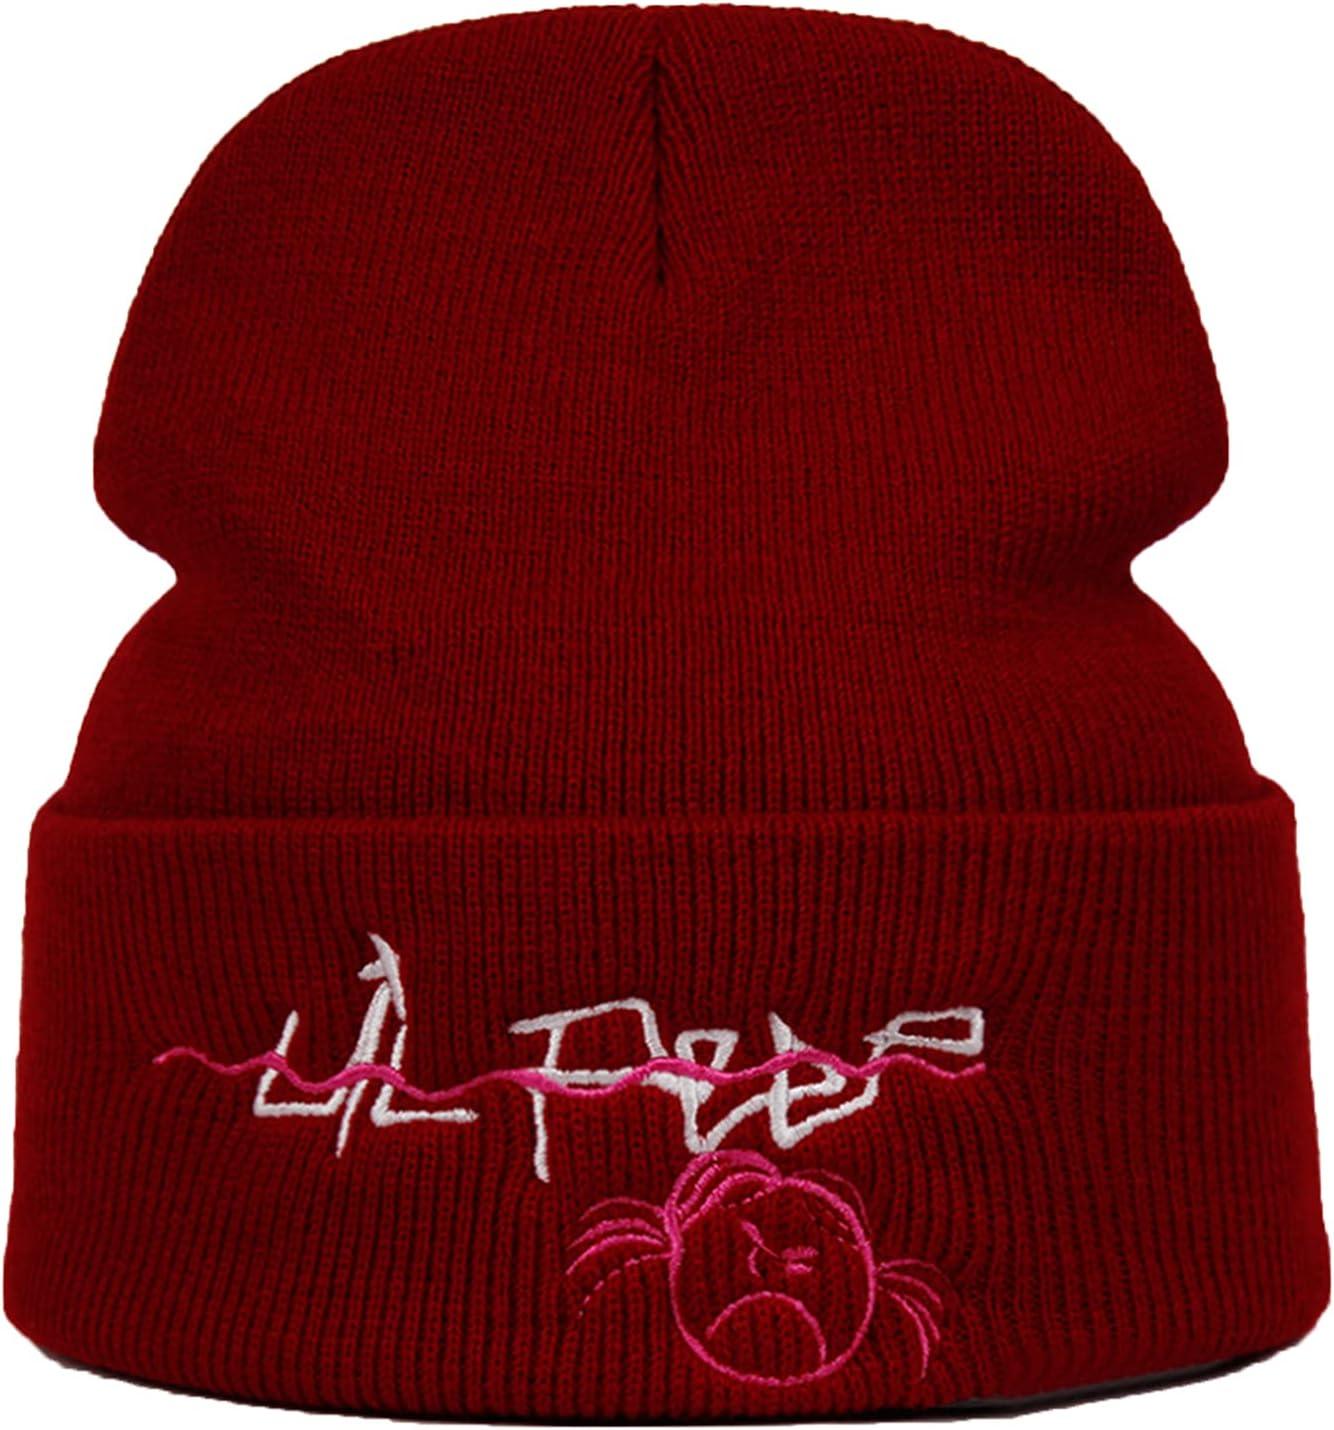 Lil Peep Embroidery Beanie Knitted Hat lil.peep Love Knit Cap Skullies Warm Winter Ski Hip Hop Hat Outdoor Hats-Burgundy